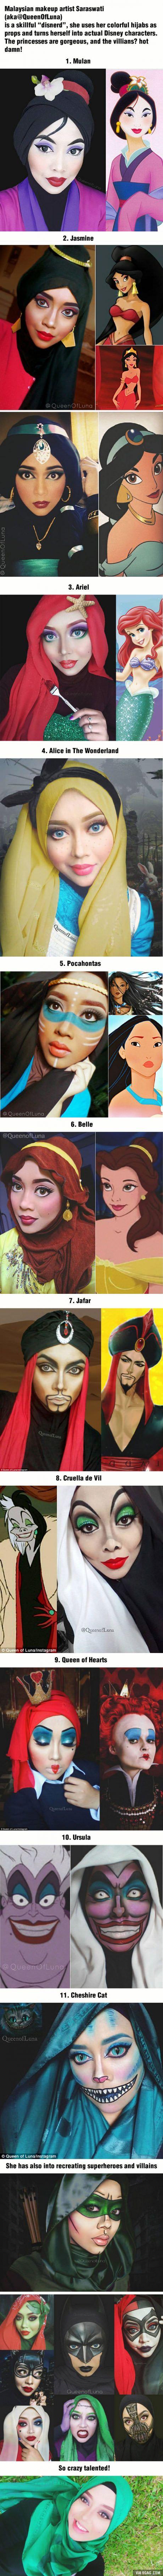 Malaysian Makeup Artist Transforms Into Stunning Disney Characters Using Her Hijab - wooooow: